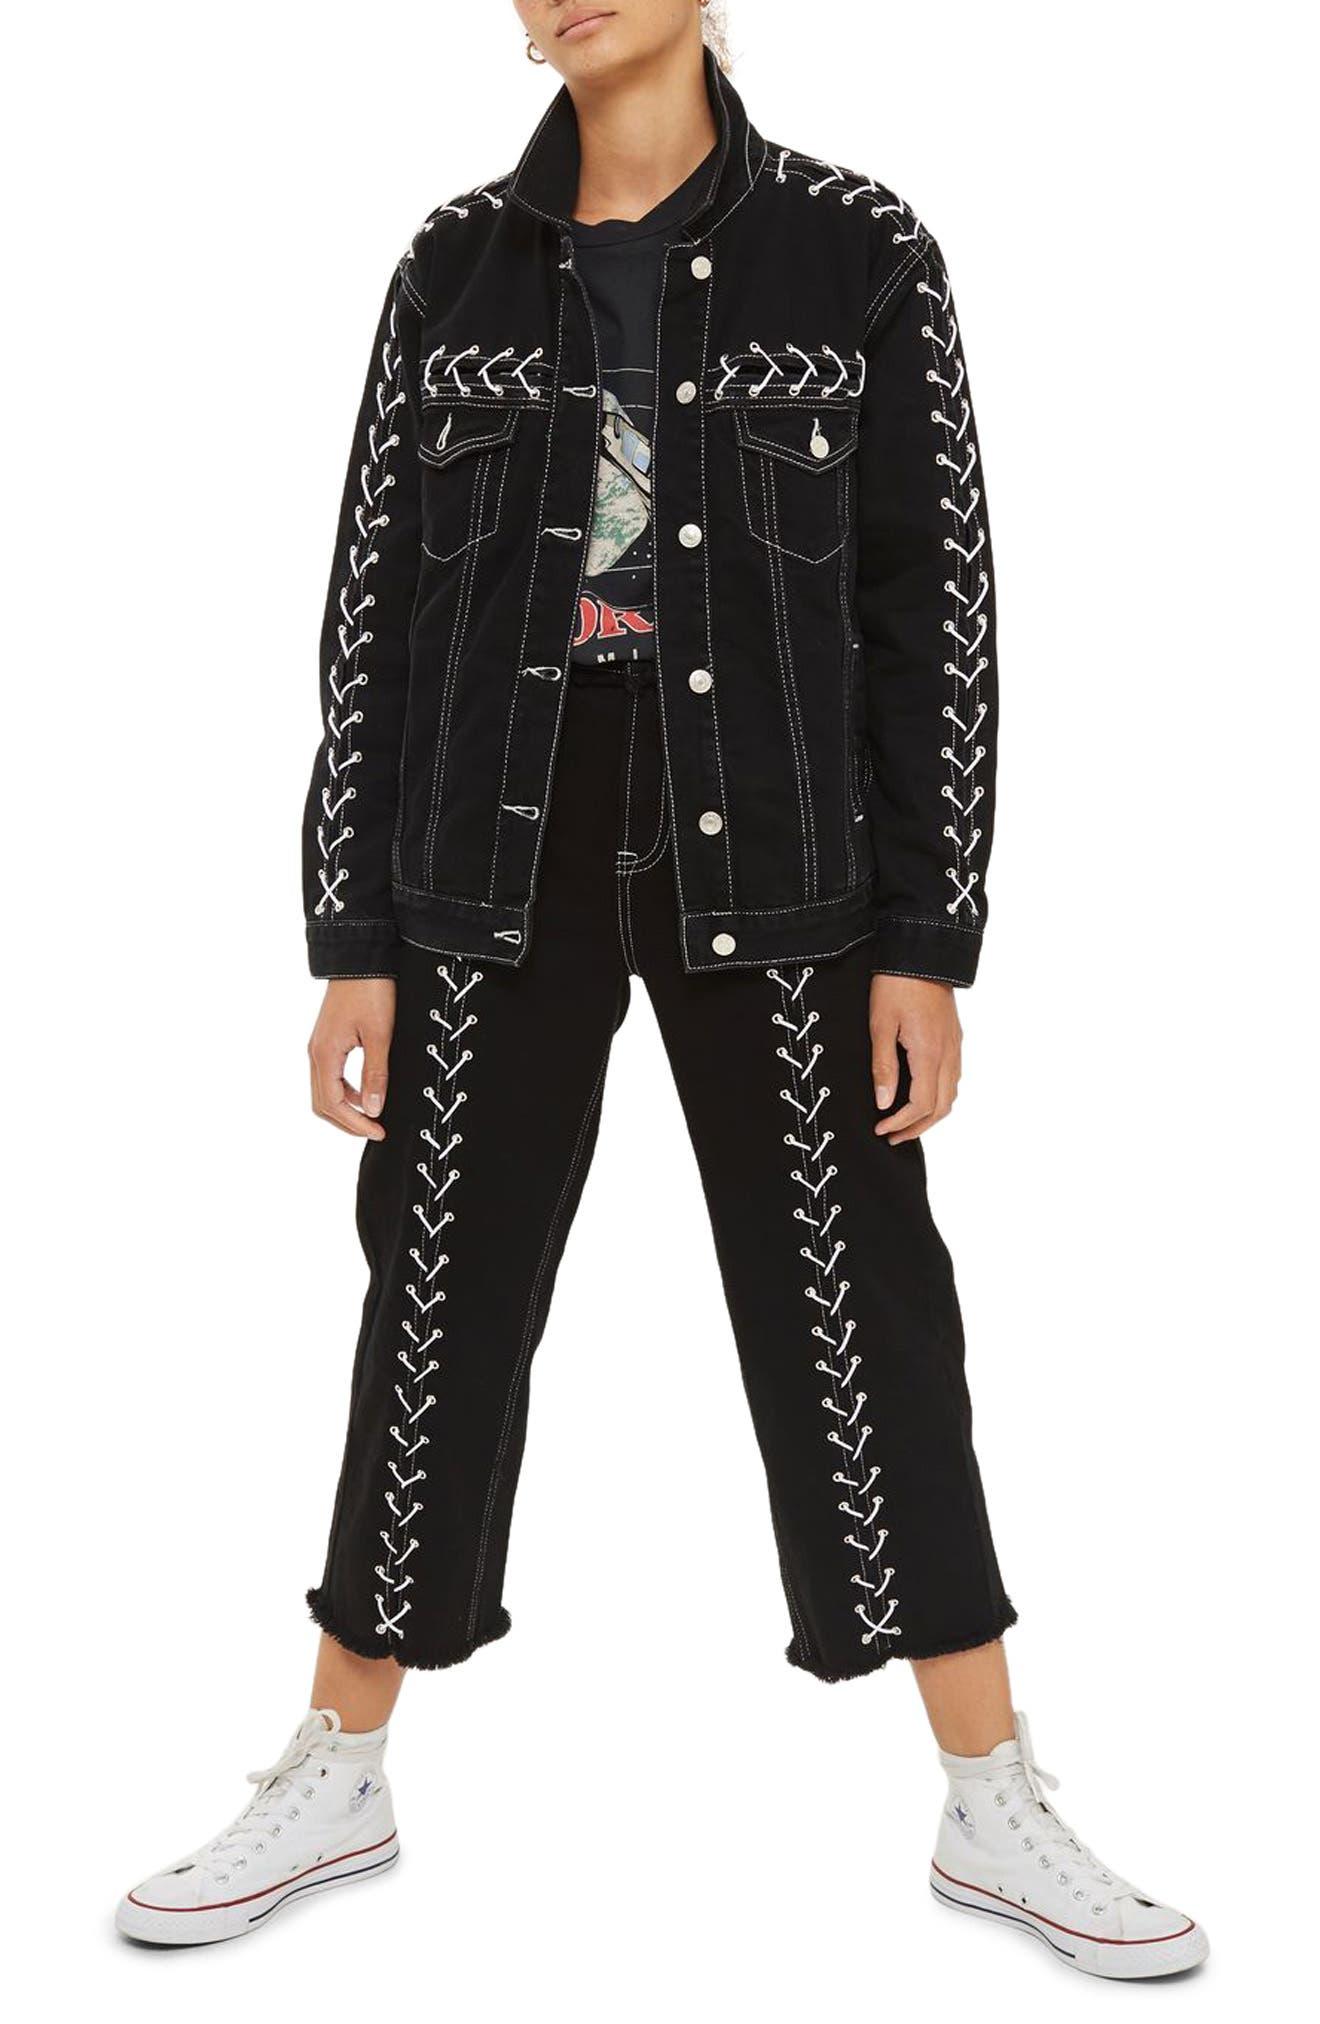 TOPSHOP Lace-Up Denim Jacket